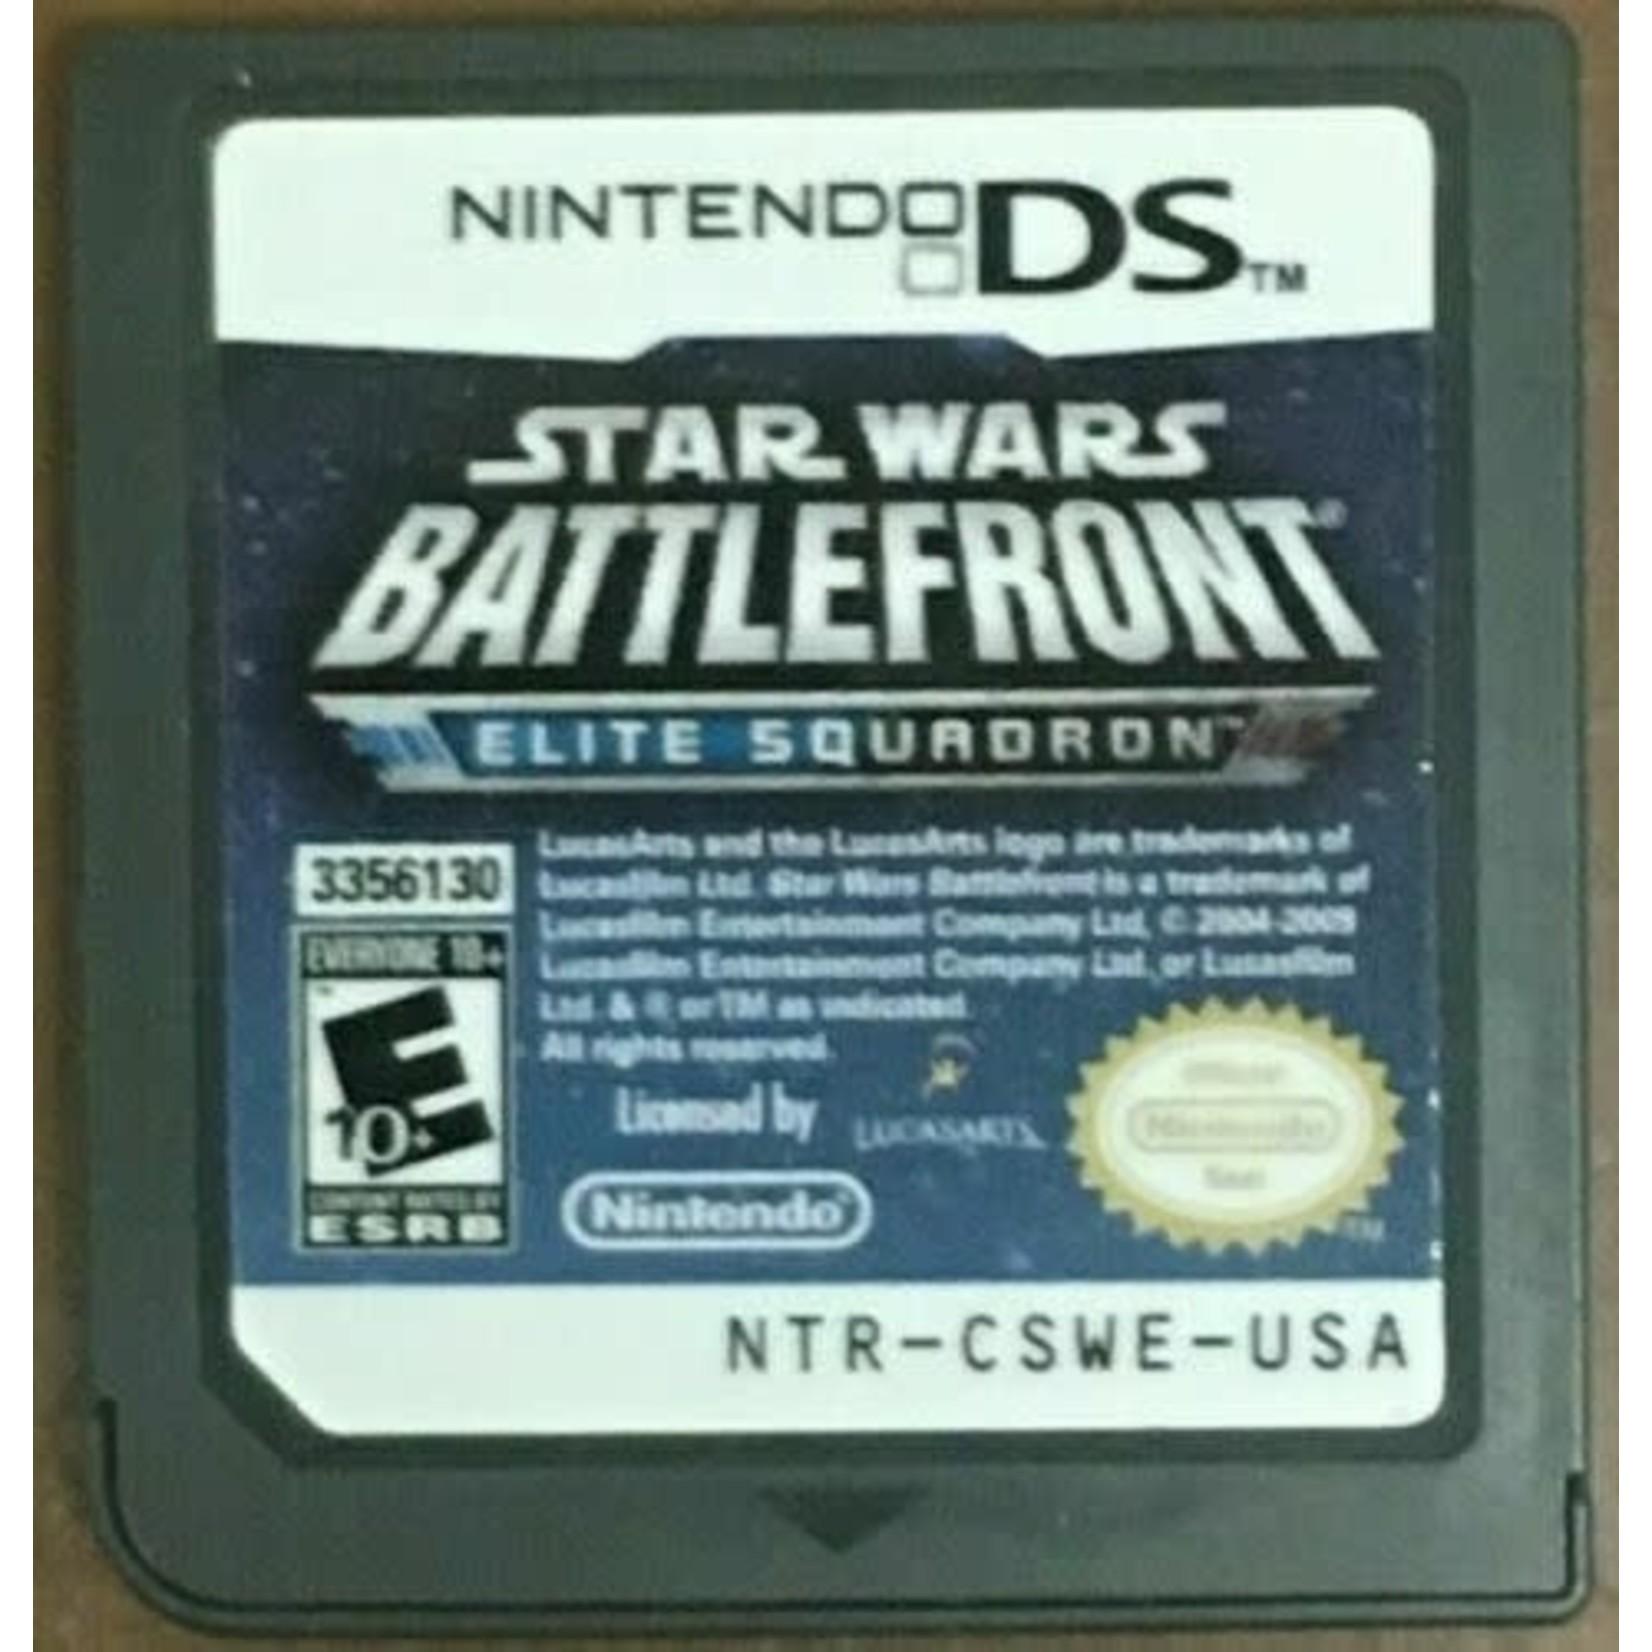 DSU-Star Wars Battlefront: Elite Squadron (Chip only)